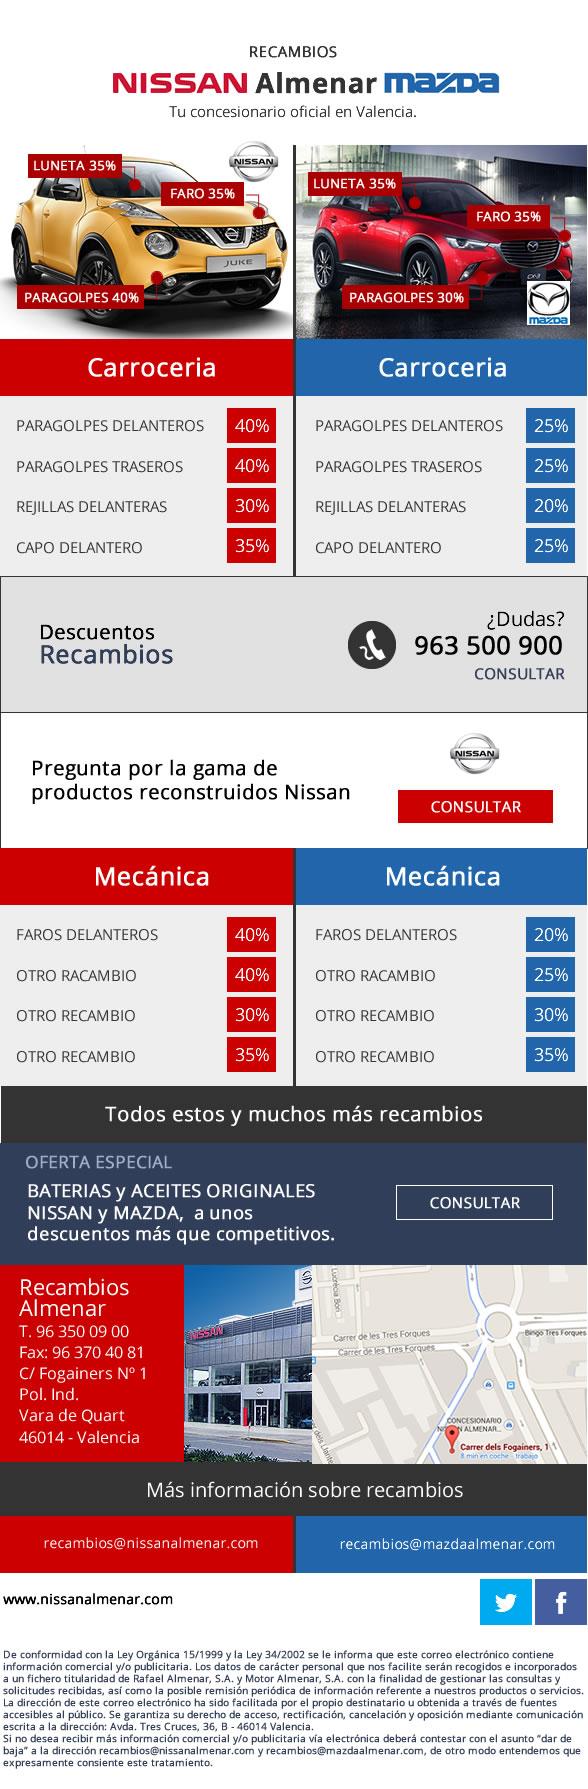 Plantillas de Newsletter Nissan Almenar Valencia - Jose Bernalte